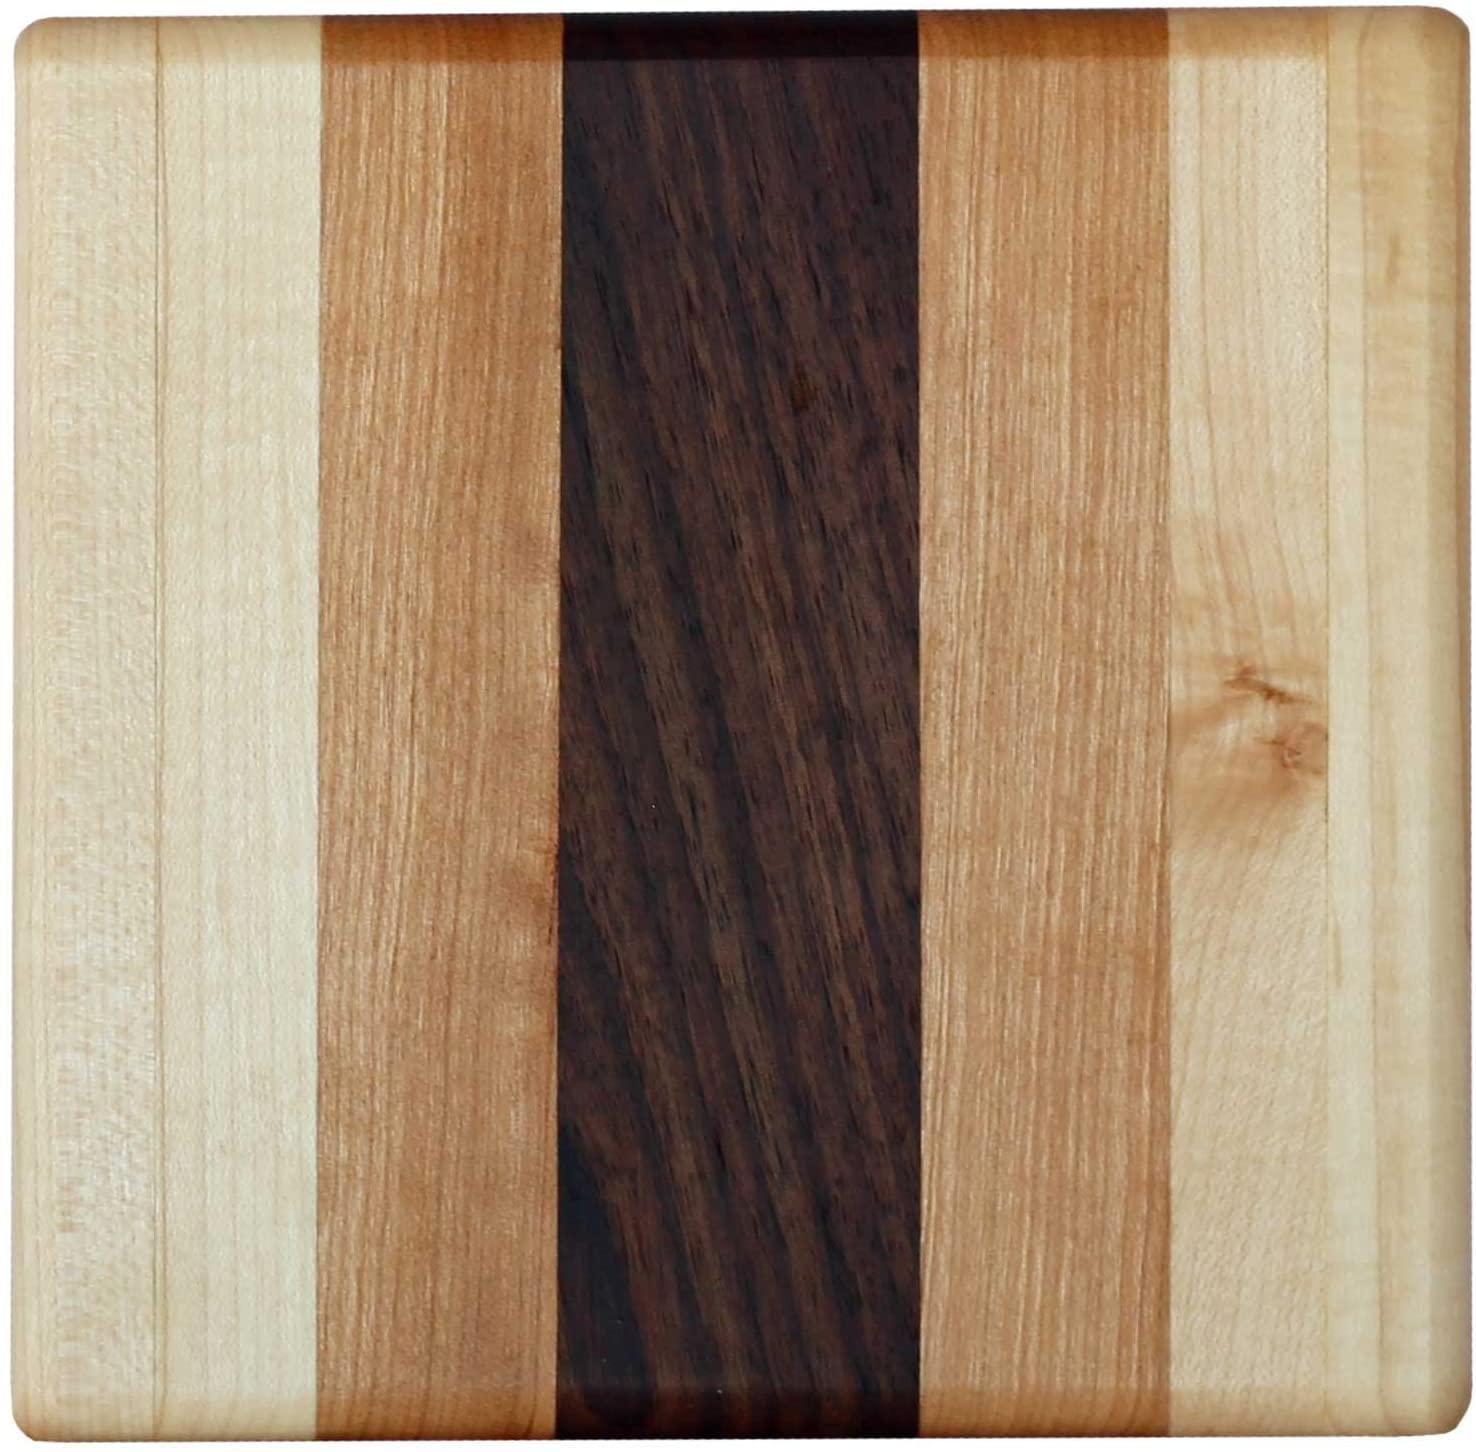 Handmade Wood Trivet, Coffee Coaster, Hot Pad, Pot Holder (Trivet 6